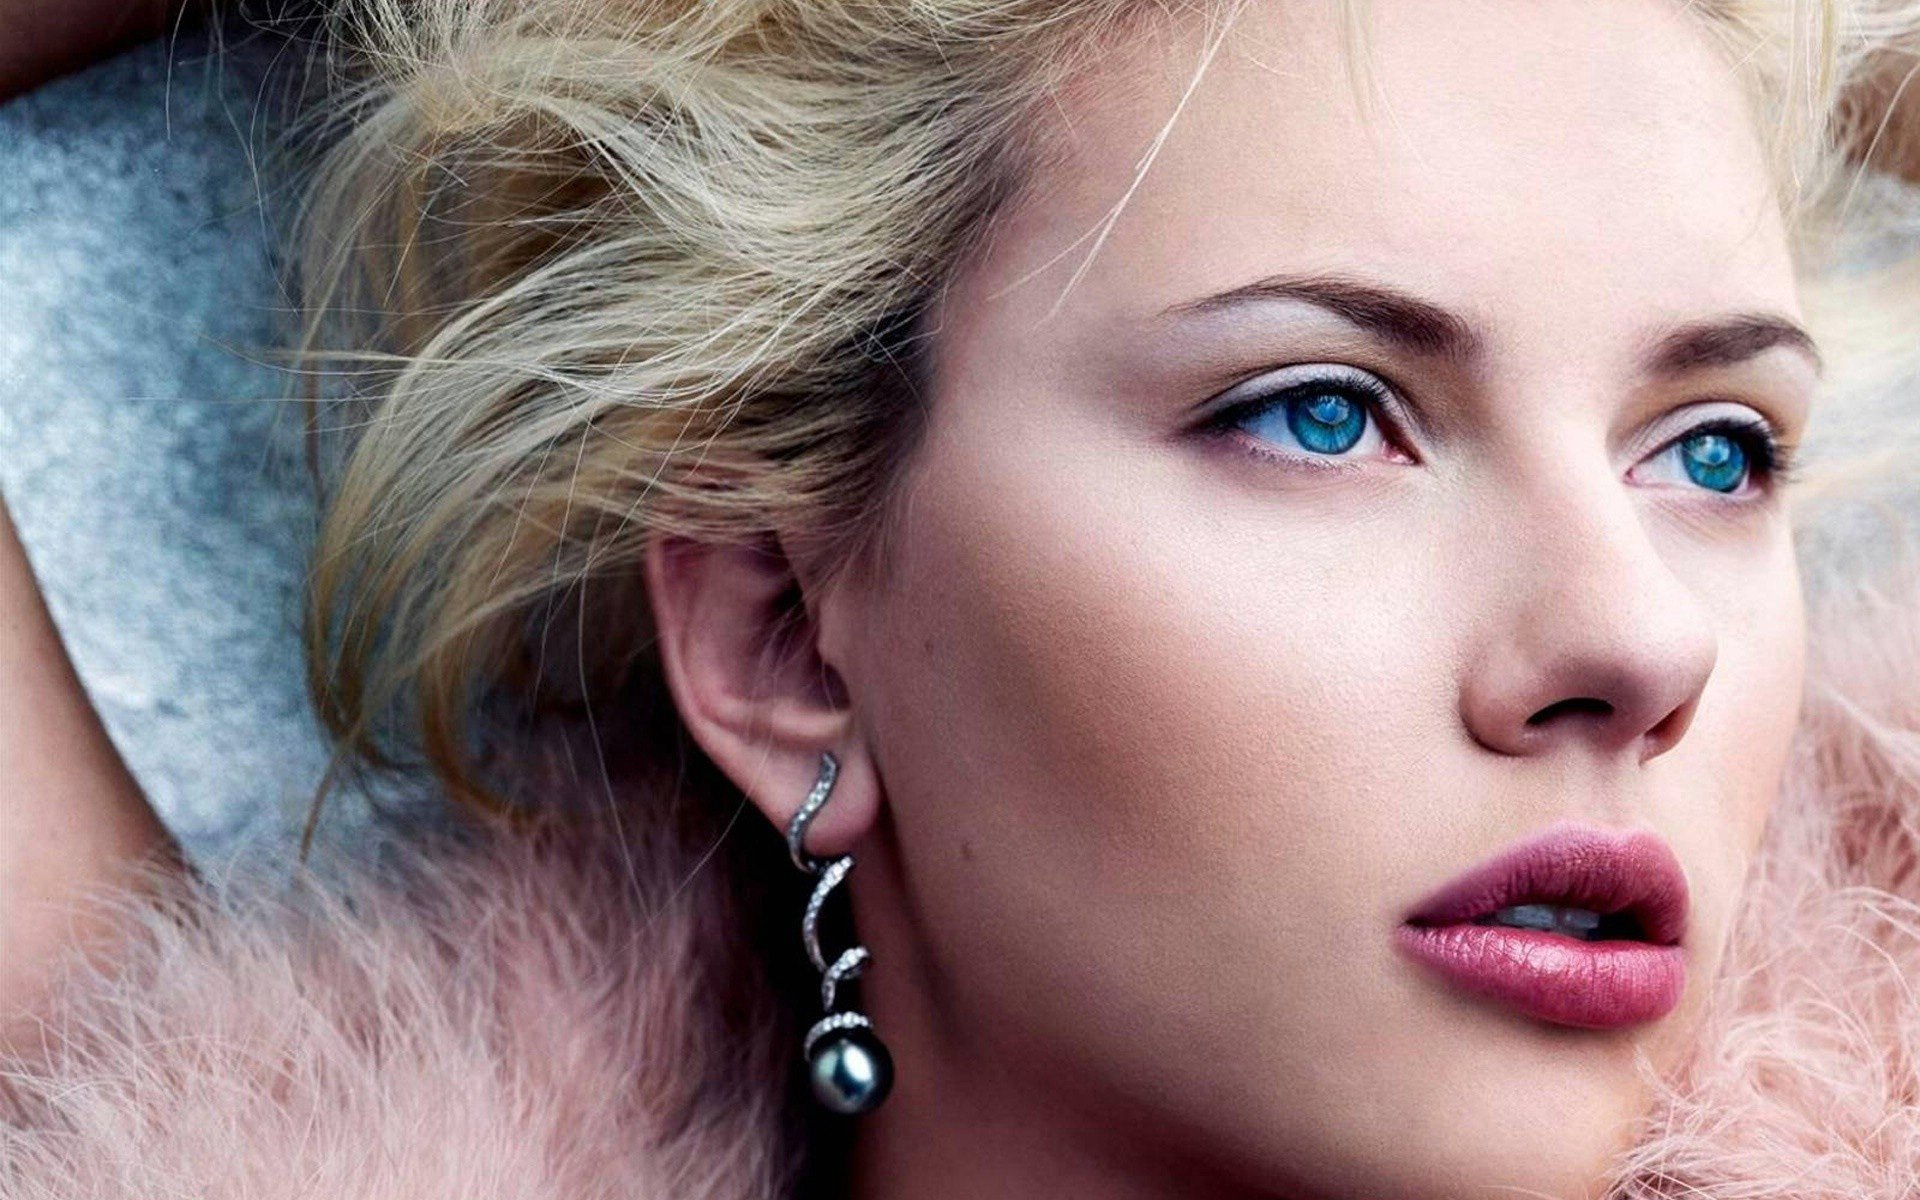 most beautiful women in the world - HD1920×1200